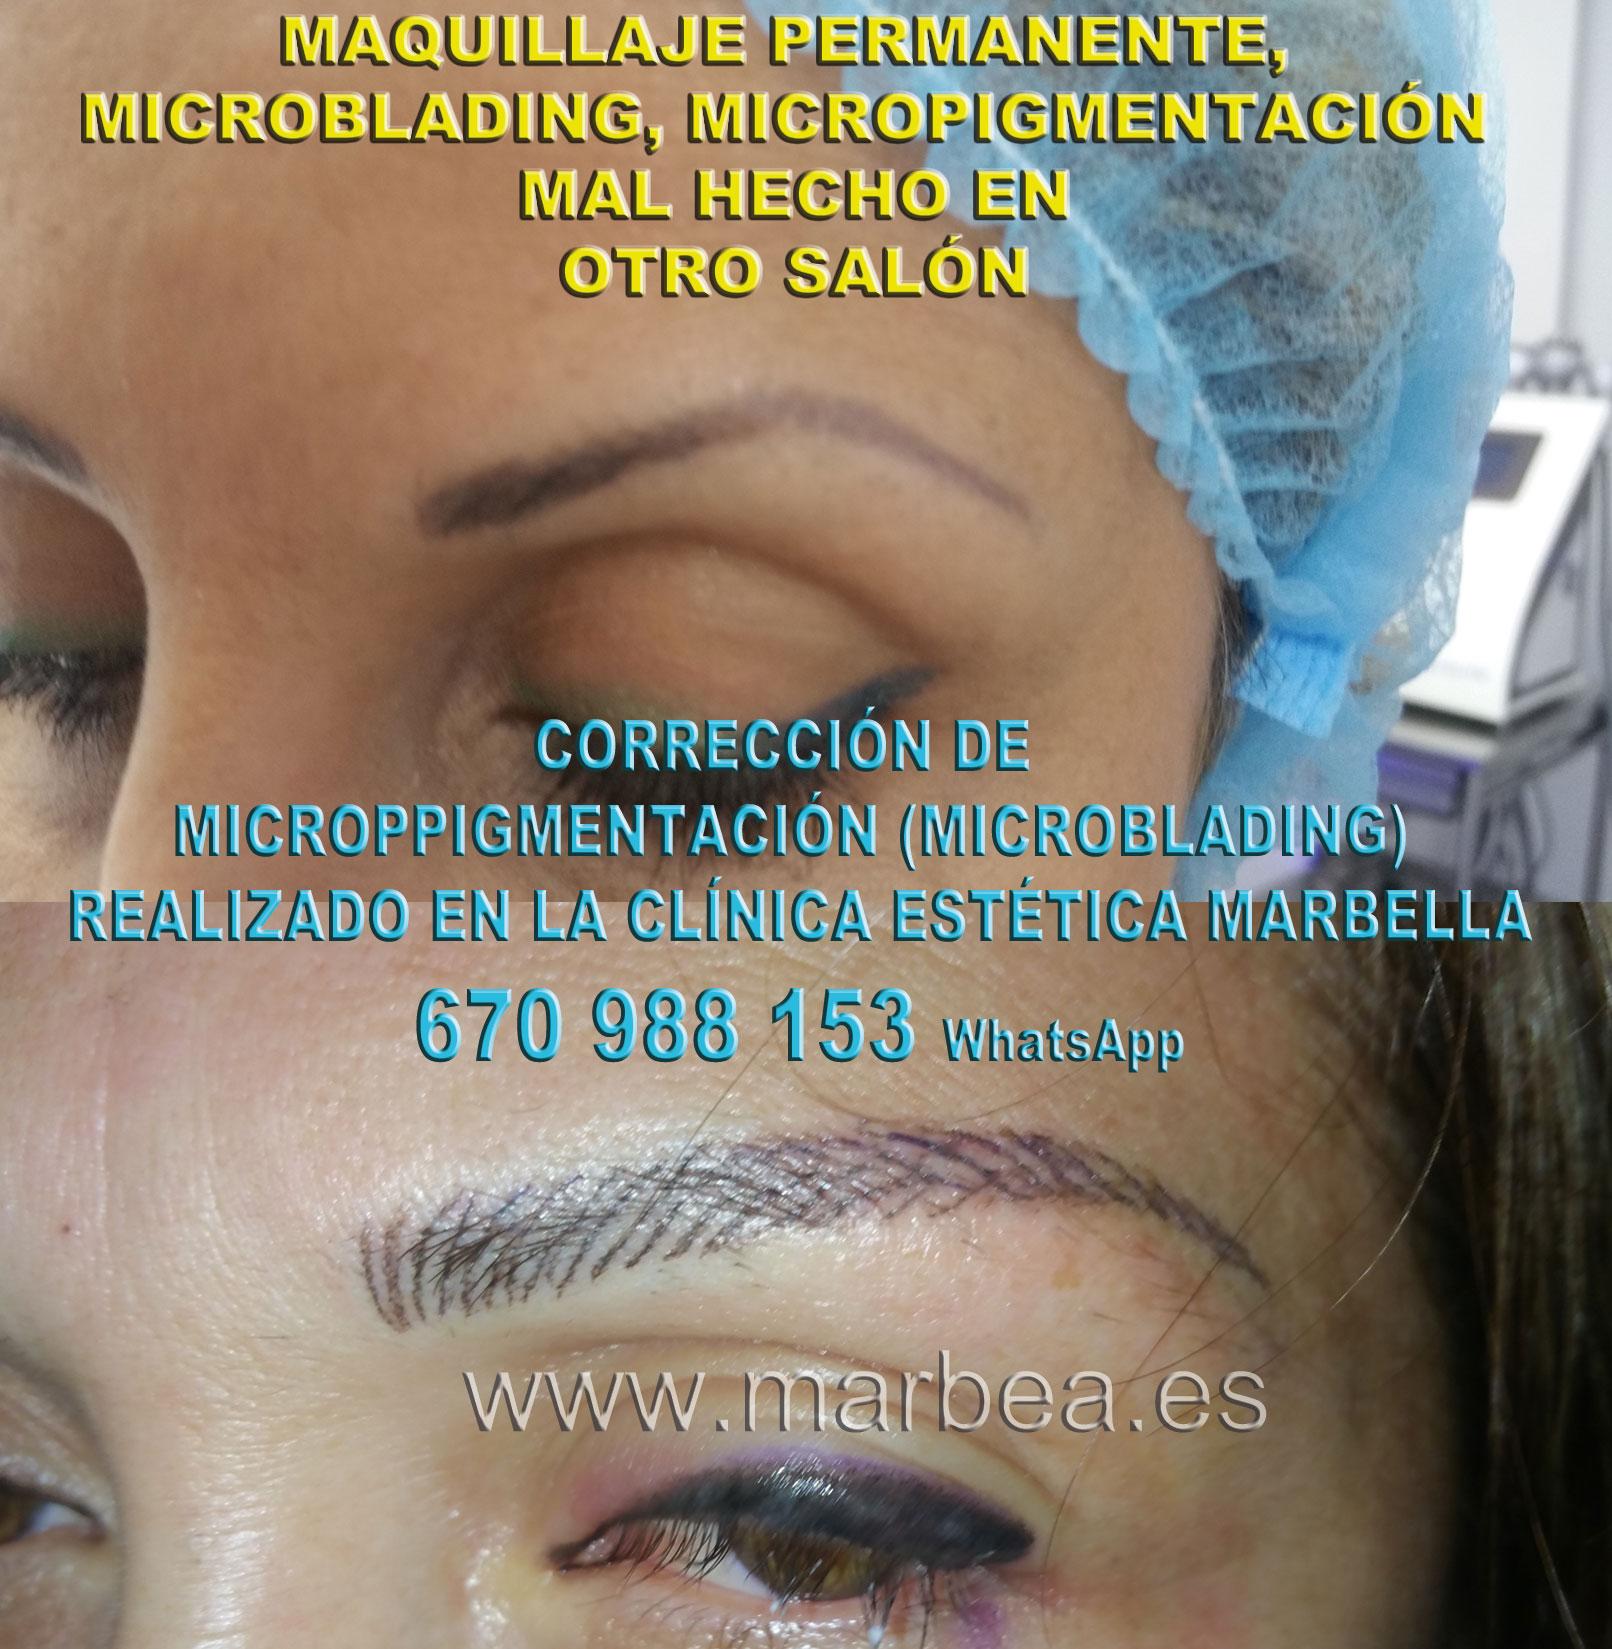 QUITAR TATUAJE CEJAS clínica estética tatuaje ofrece eliminar la micropigmentación de cejas,corregir micropigmentación no deseada